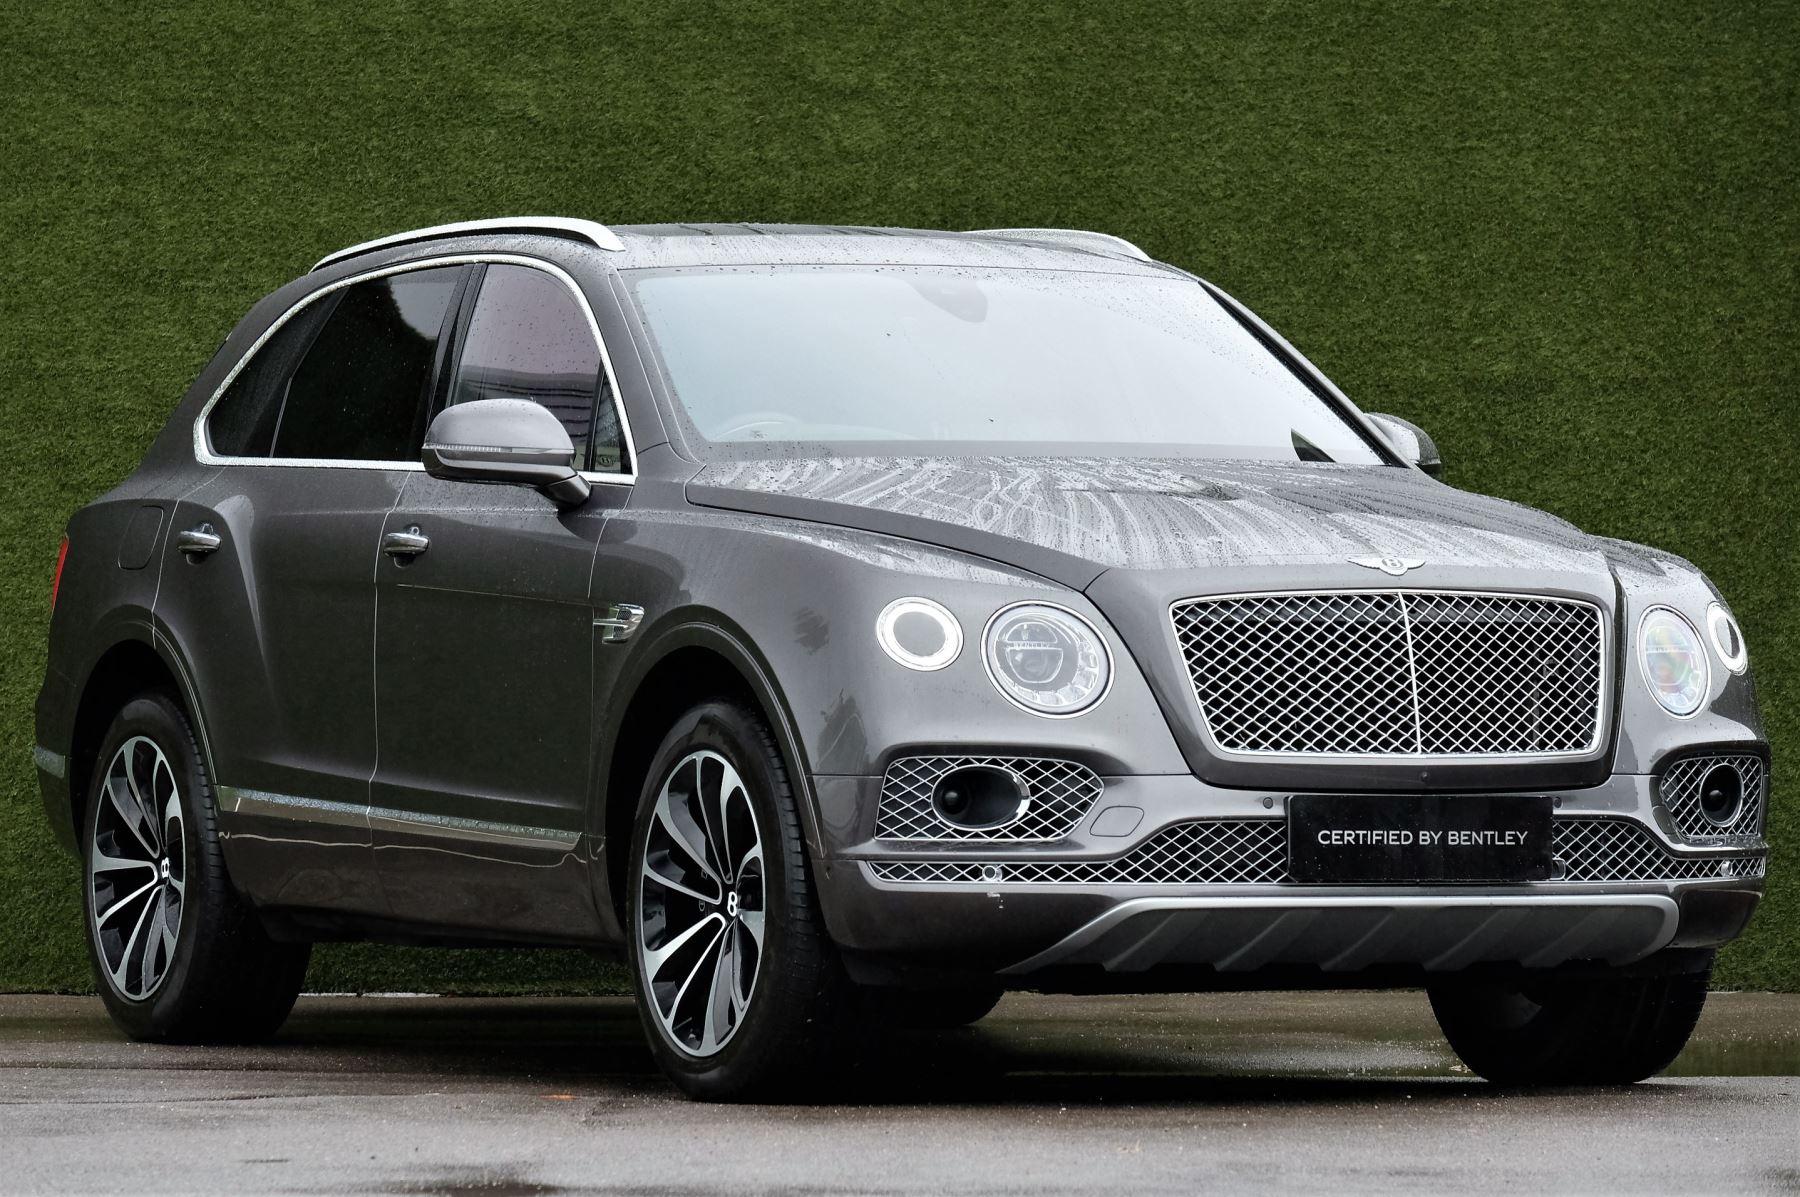 Bentley Bentayga 4.0 V8 5dr - Mulliner Driving Specification Automatic Estate